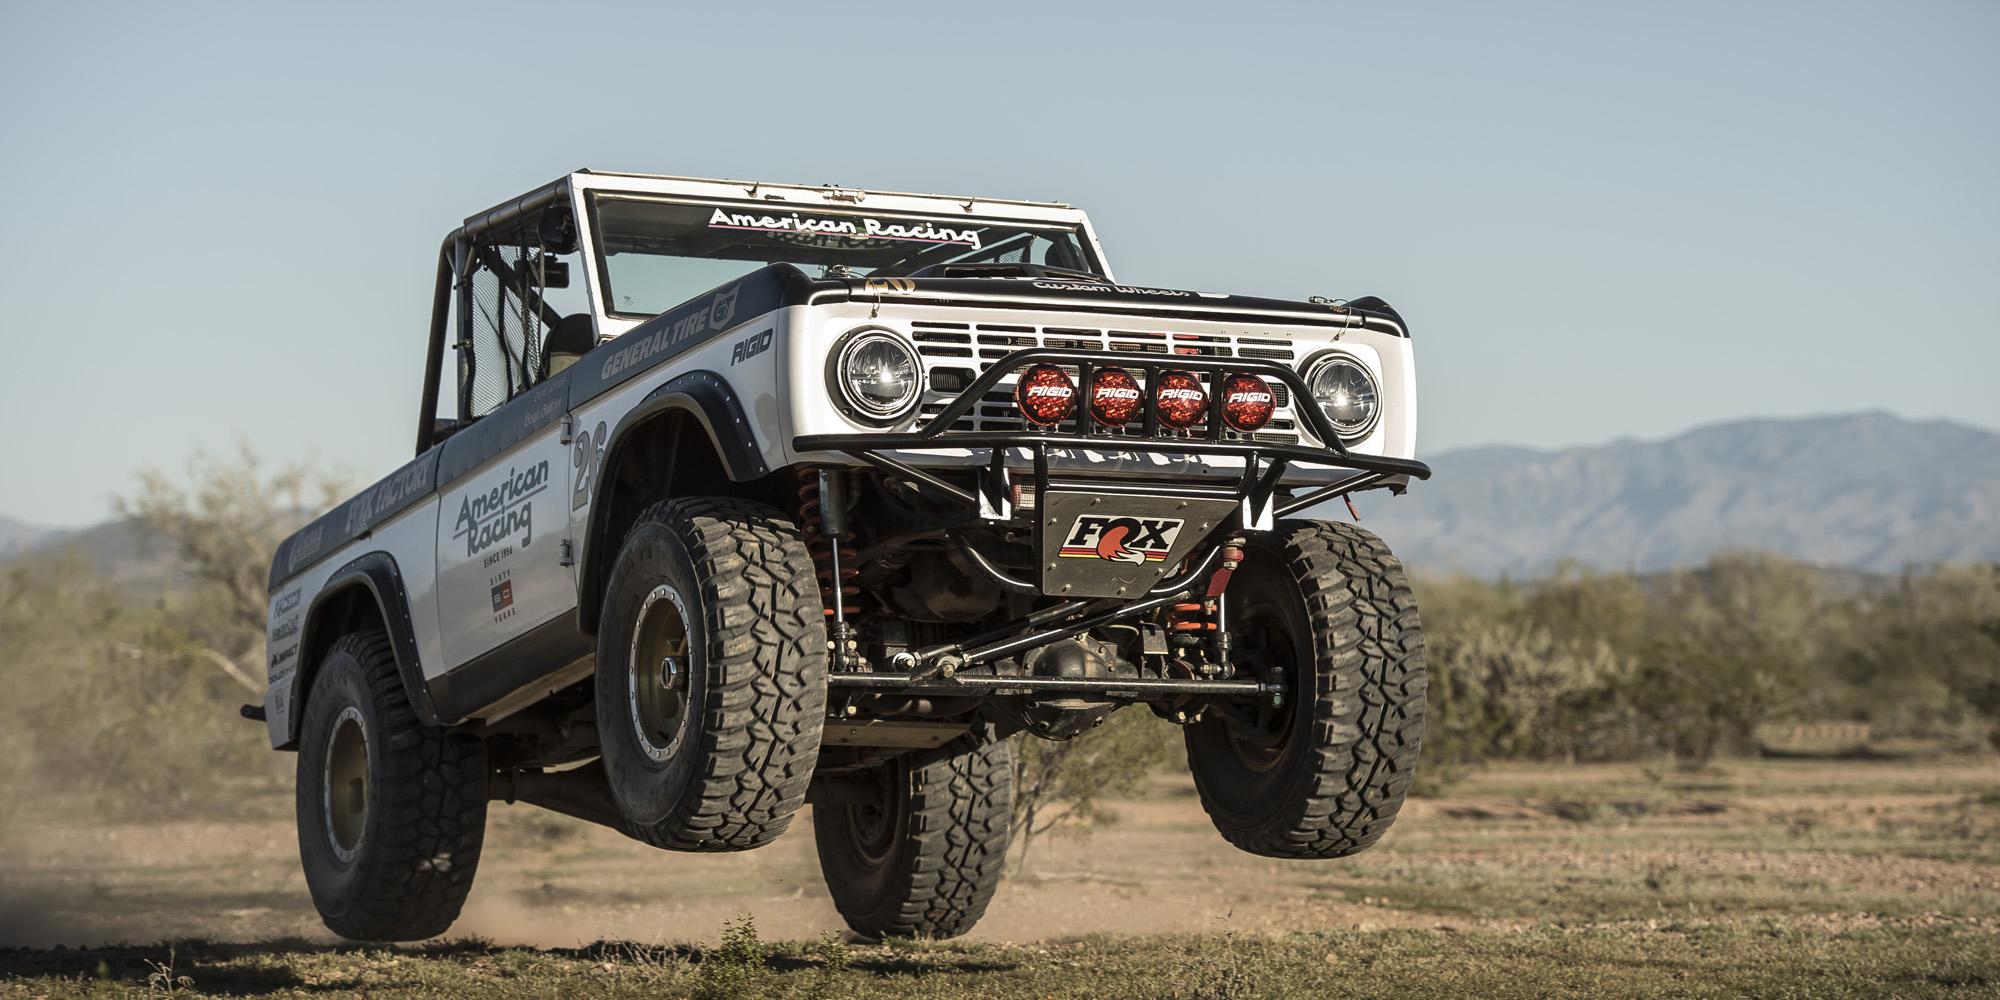 Vintage Bronco Desert Racing